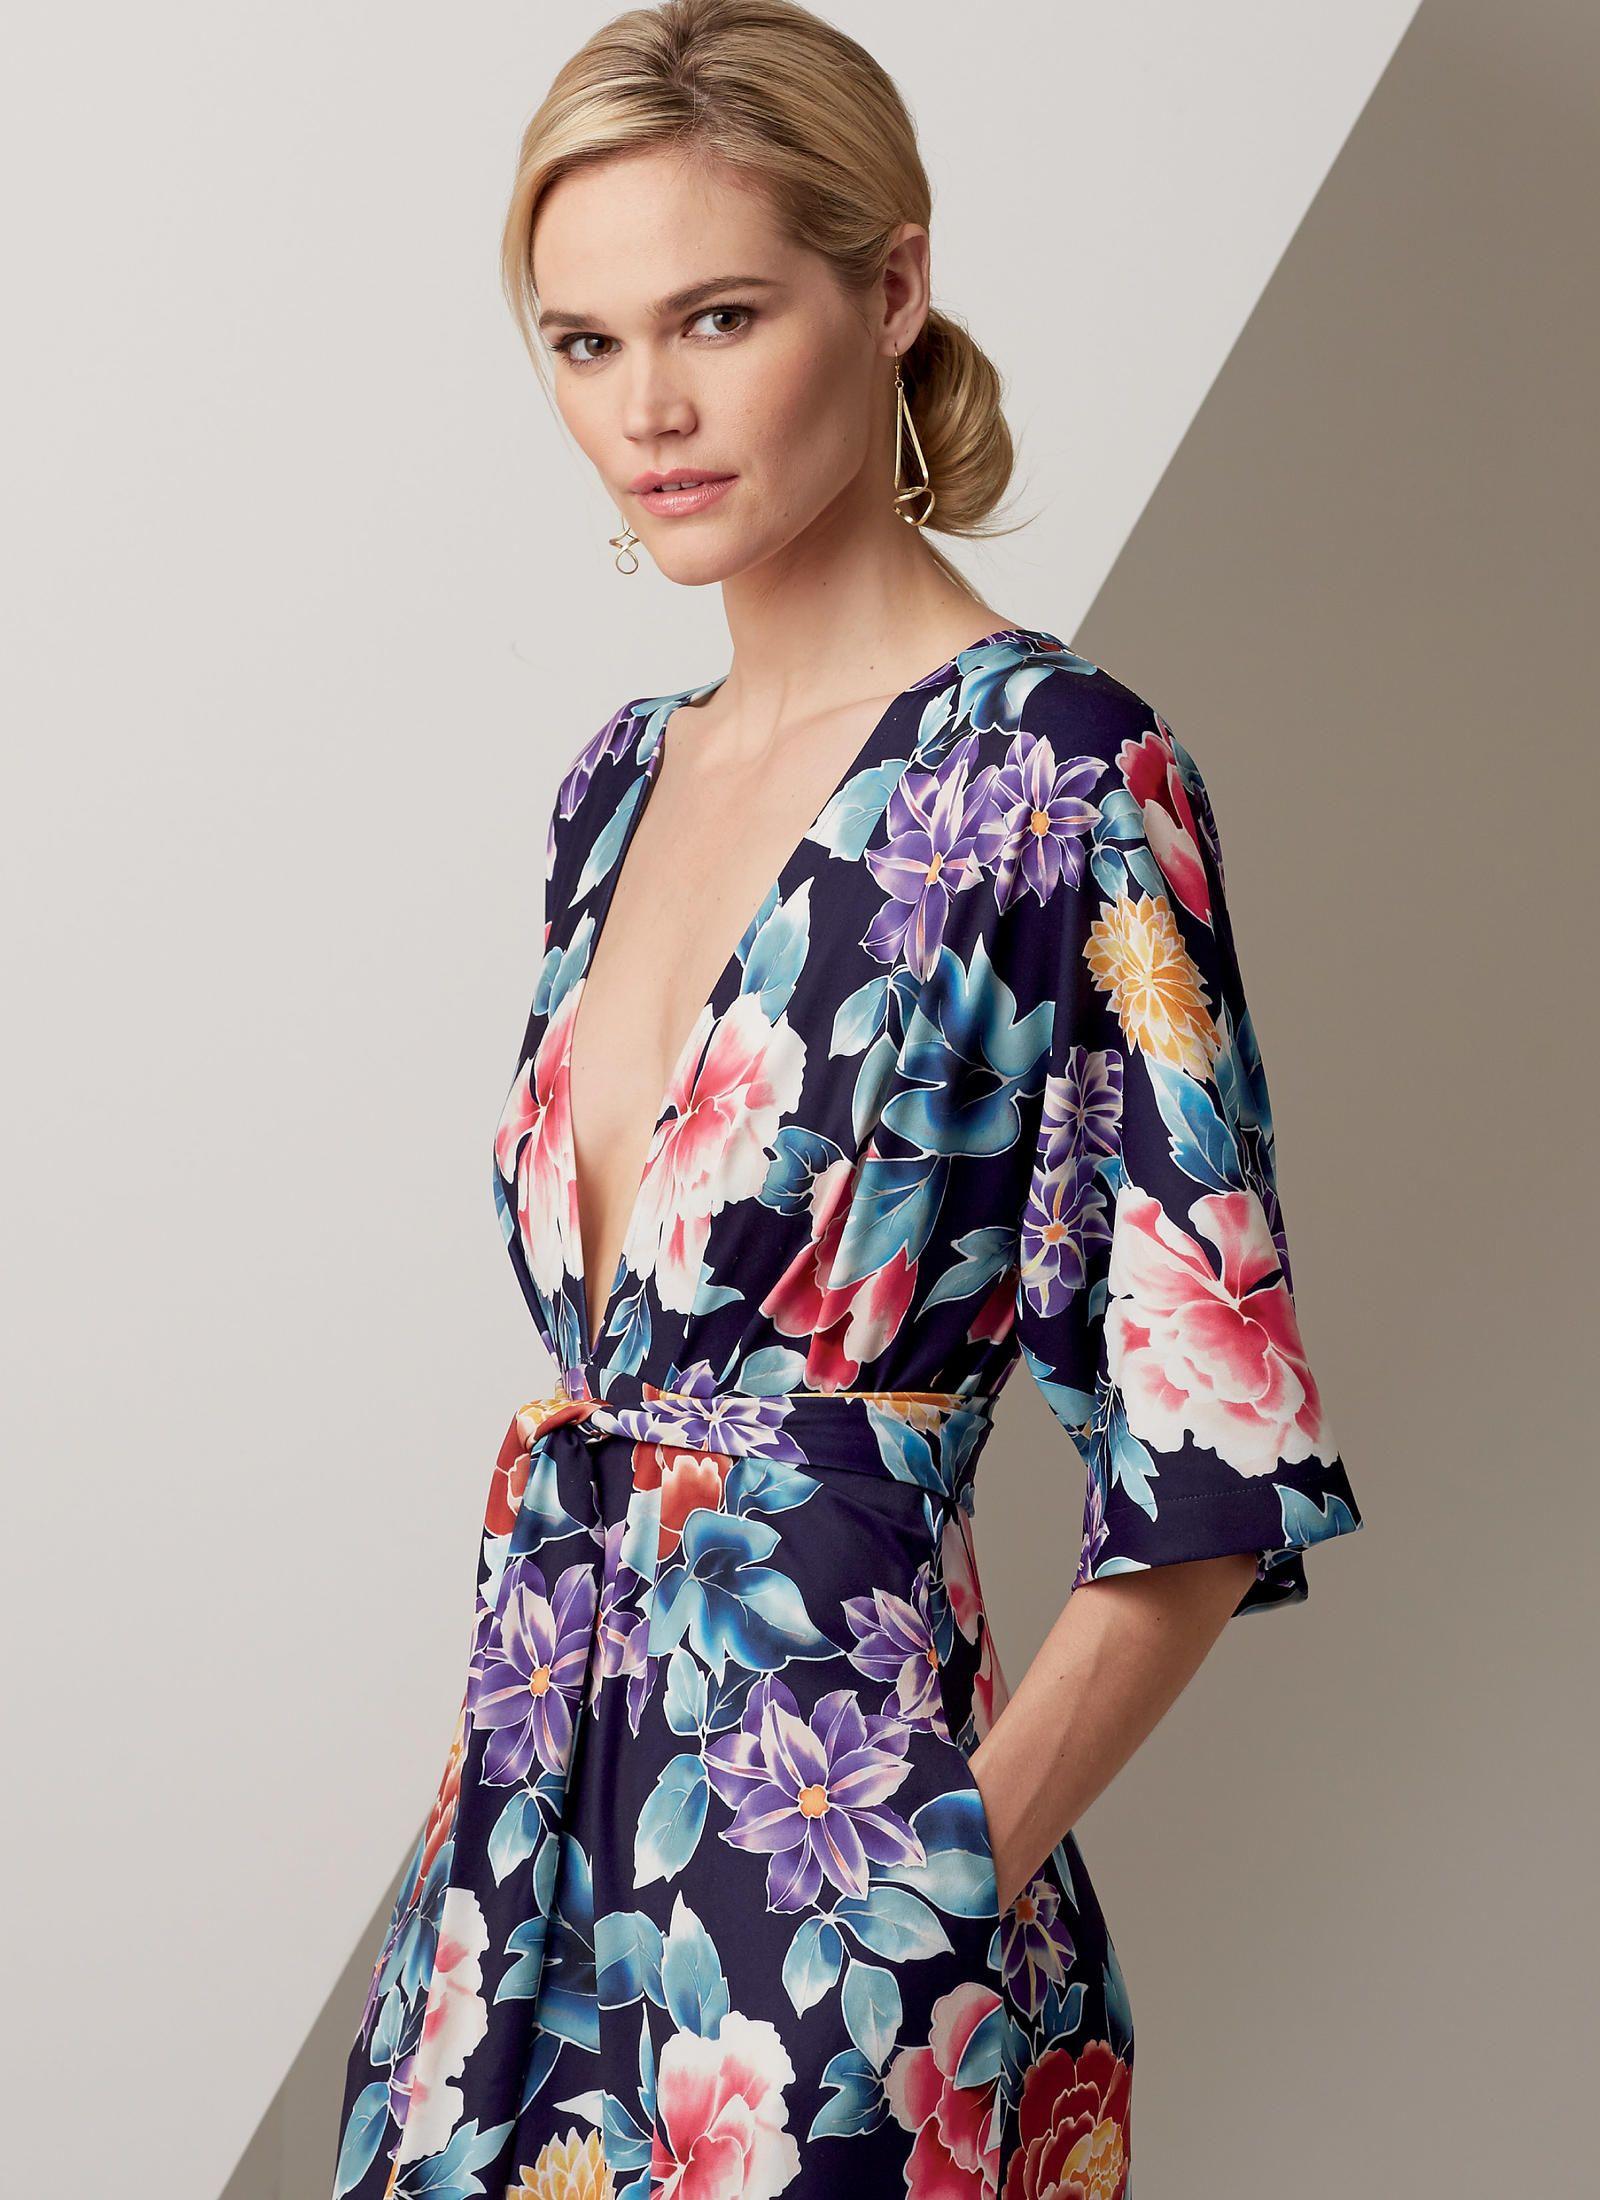 V9253   Vogue Patterns   sew   Pinterest